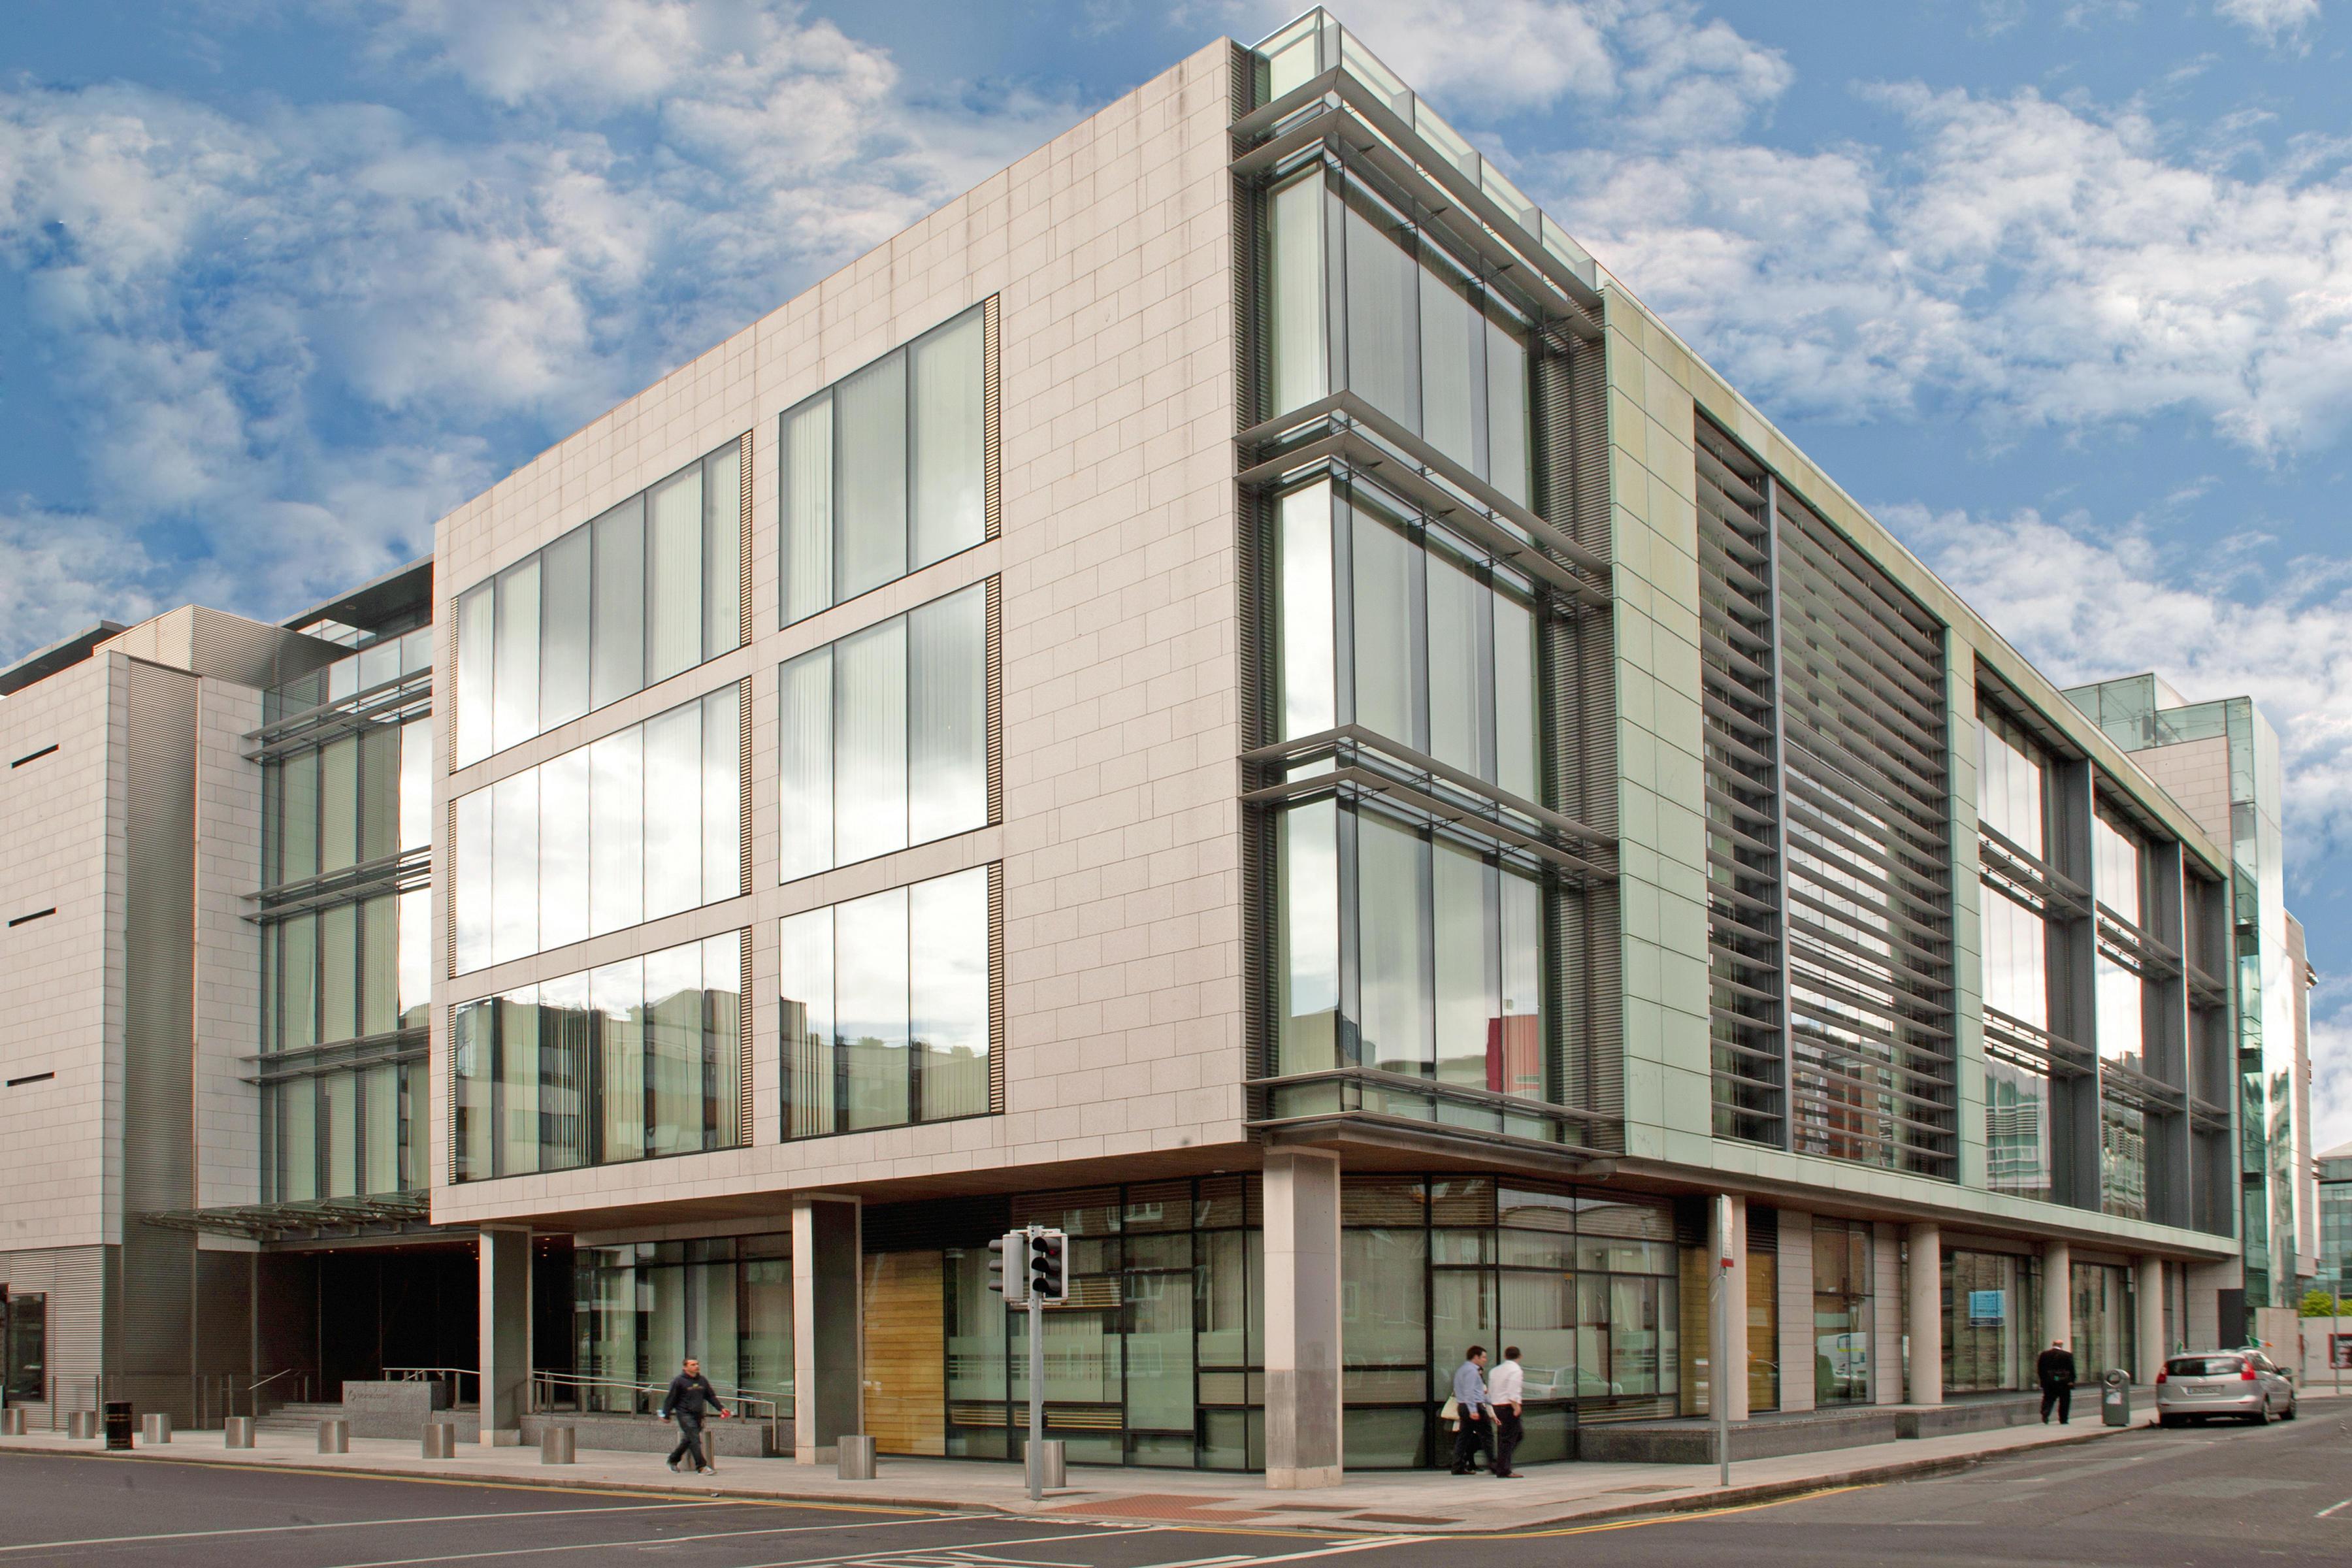 Northern Trust   Georges Court, 54 - 62 Townsend Street, Dublin 2, Dublin, D02 R156   +353 1 542 2000